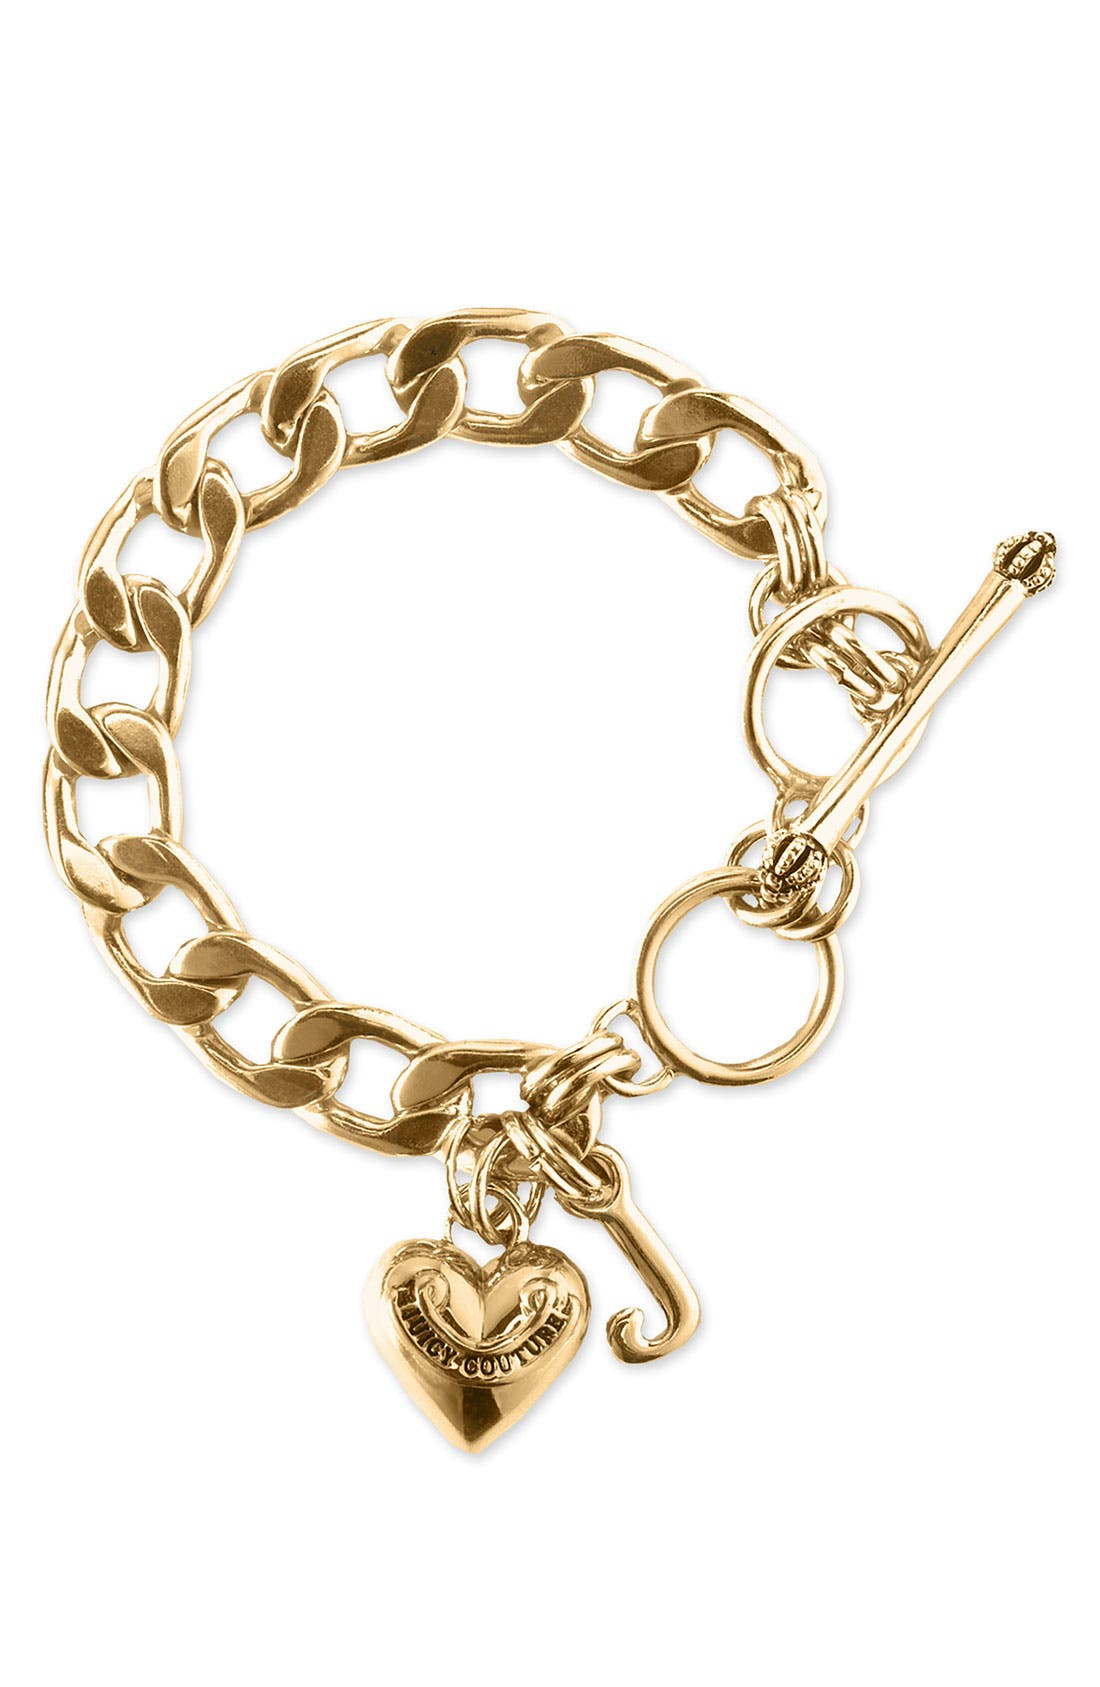 Alternate Image 1 Selected - Juicy Couture Link Bracelet (Girls)